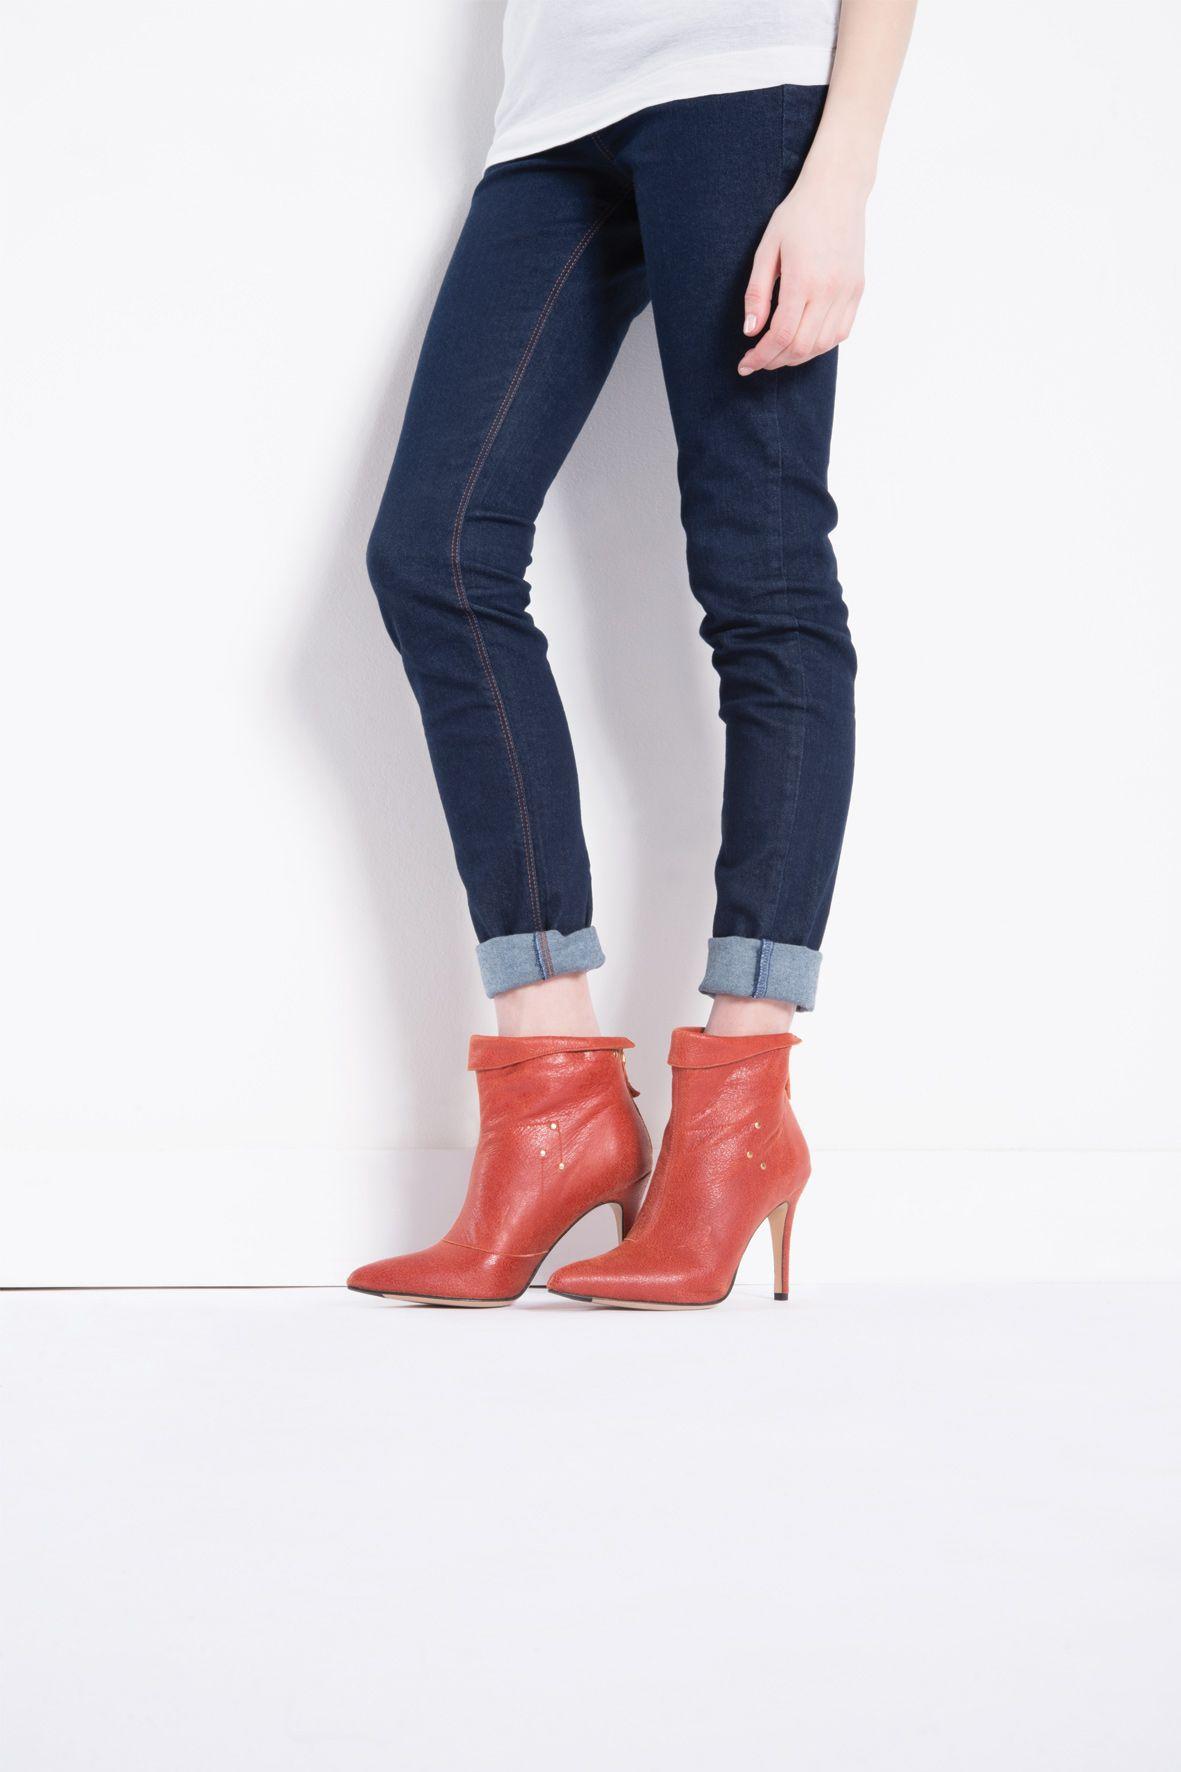 Suzanne rouille lambskin - Suzanne - Women's shoes // Jérôme Dreyfuss - Official Store